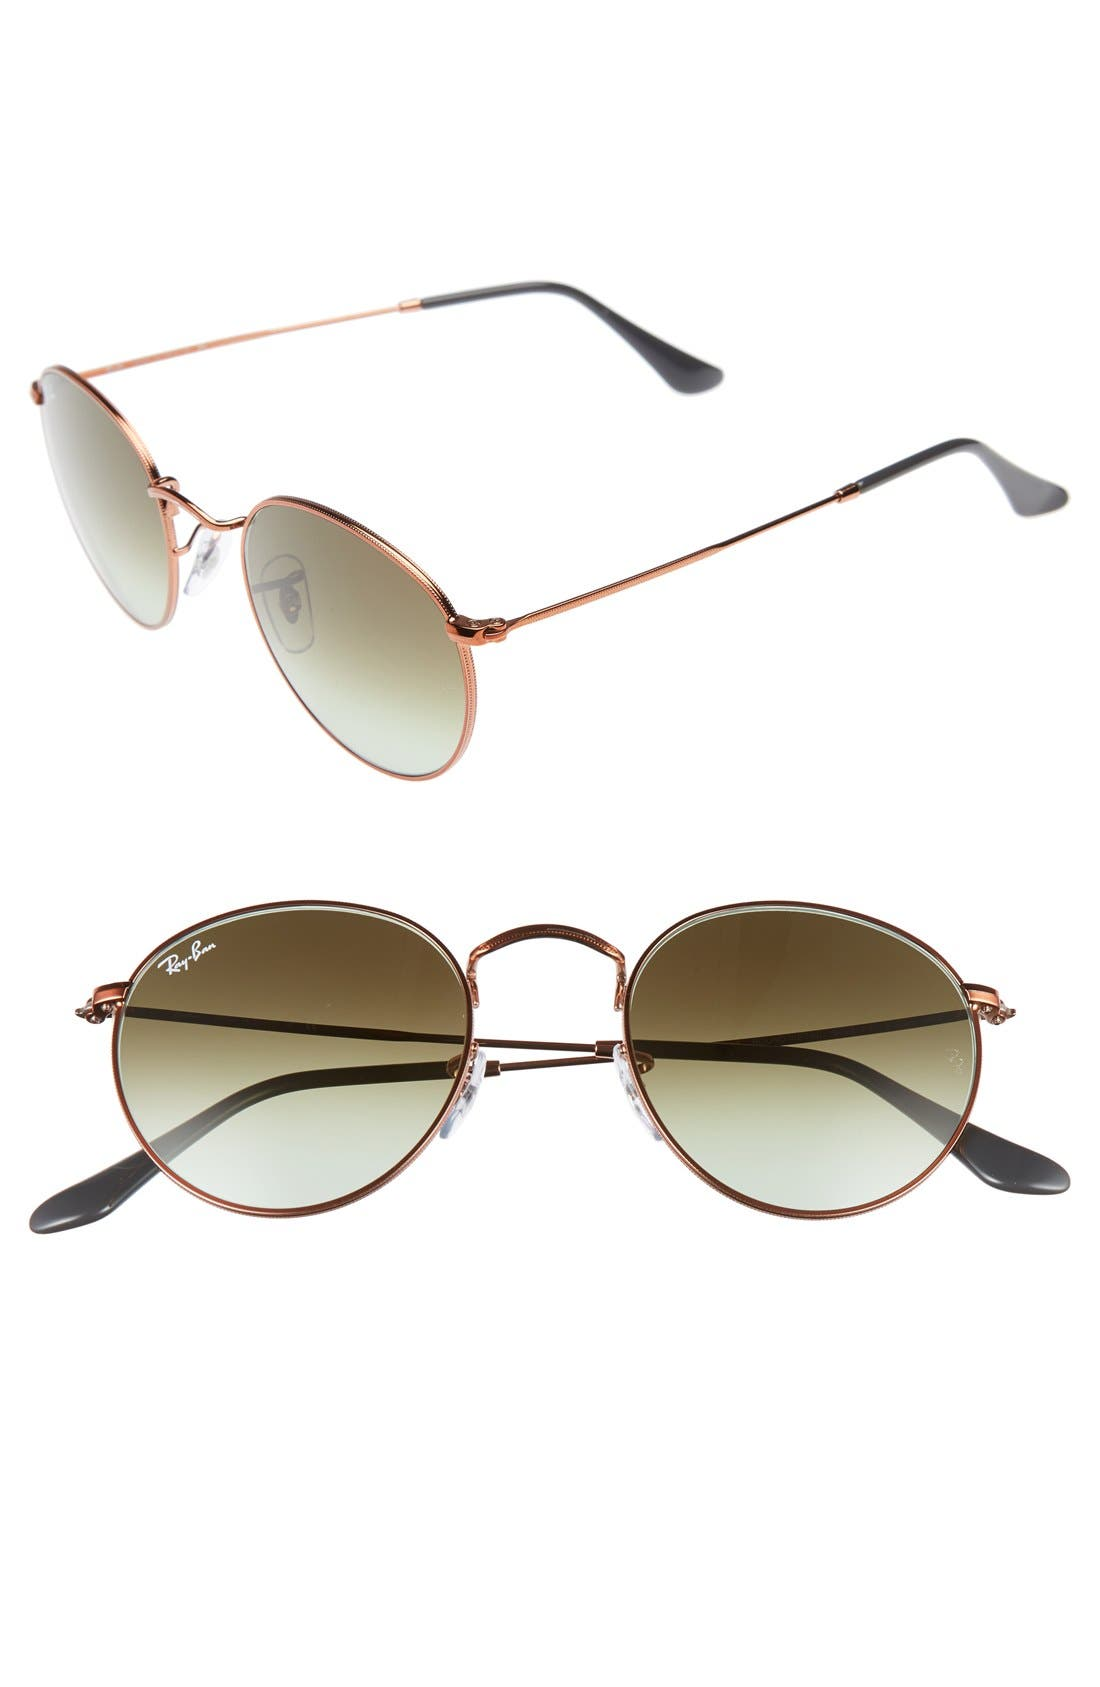 Icons 50mm Retro Sunglasses,                         Main,                         color, Green/ Brown